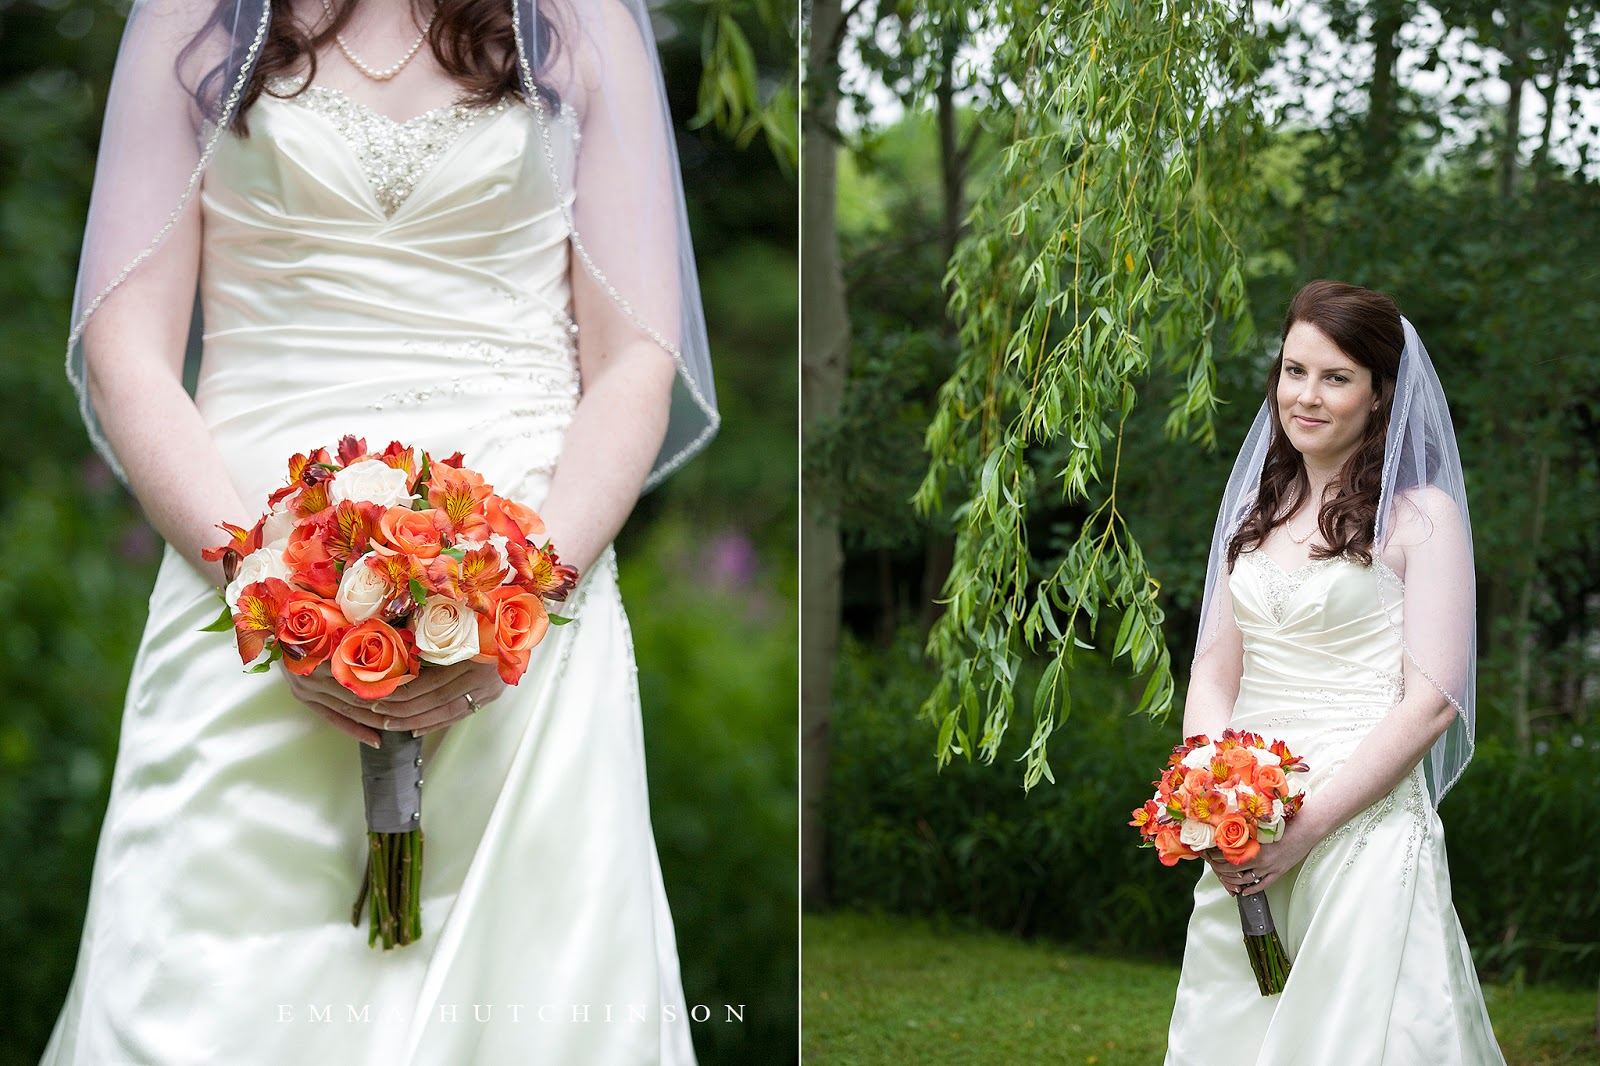 Bride wearing Maggie Sottero wedding dress